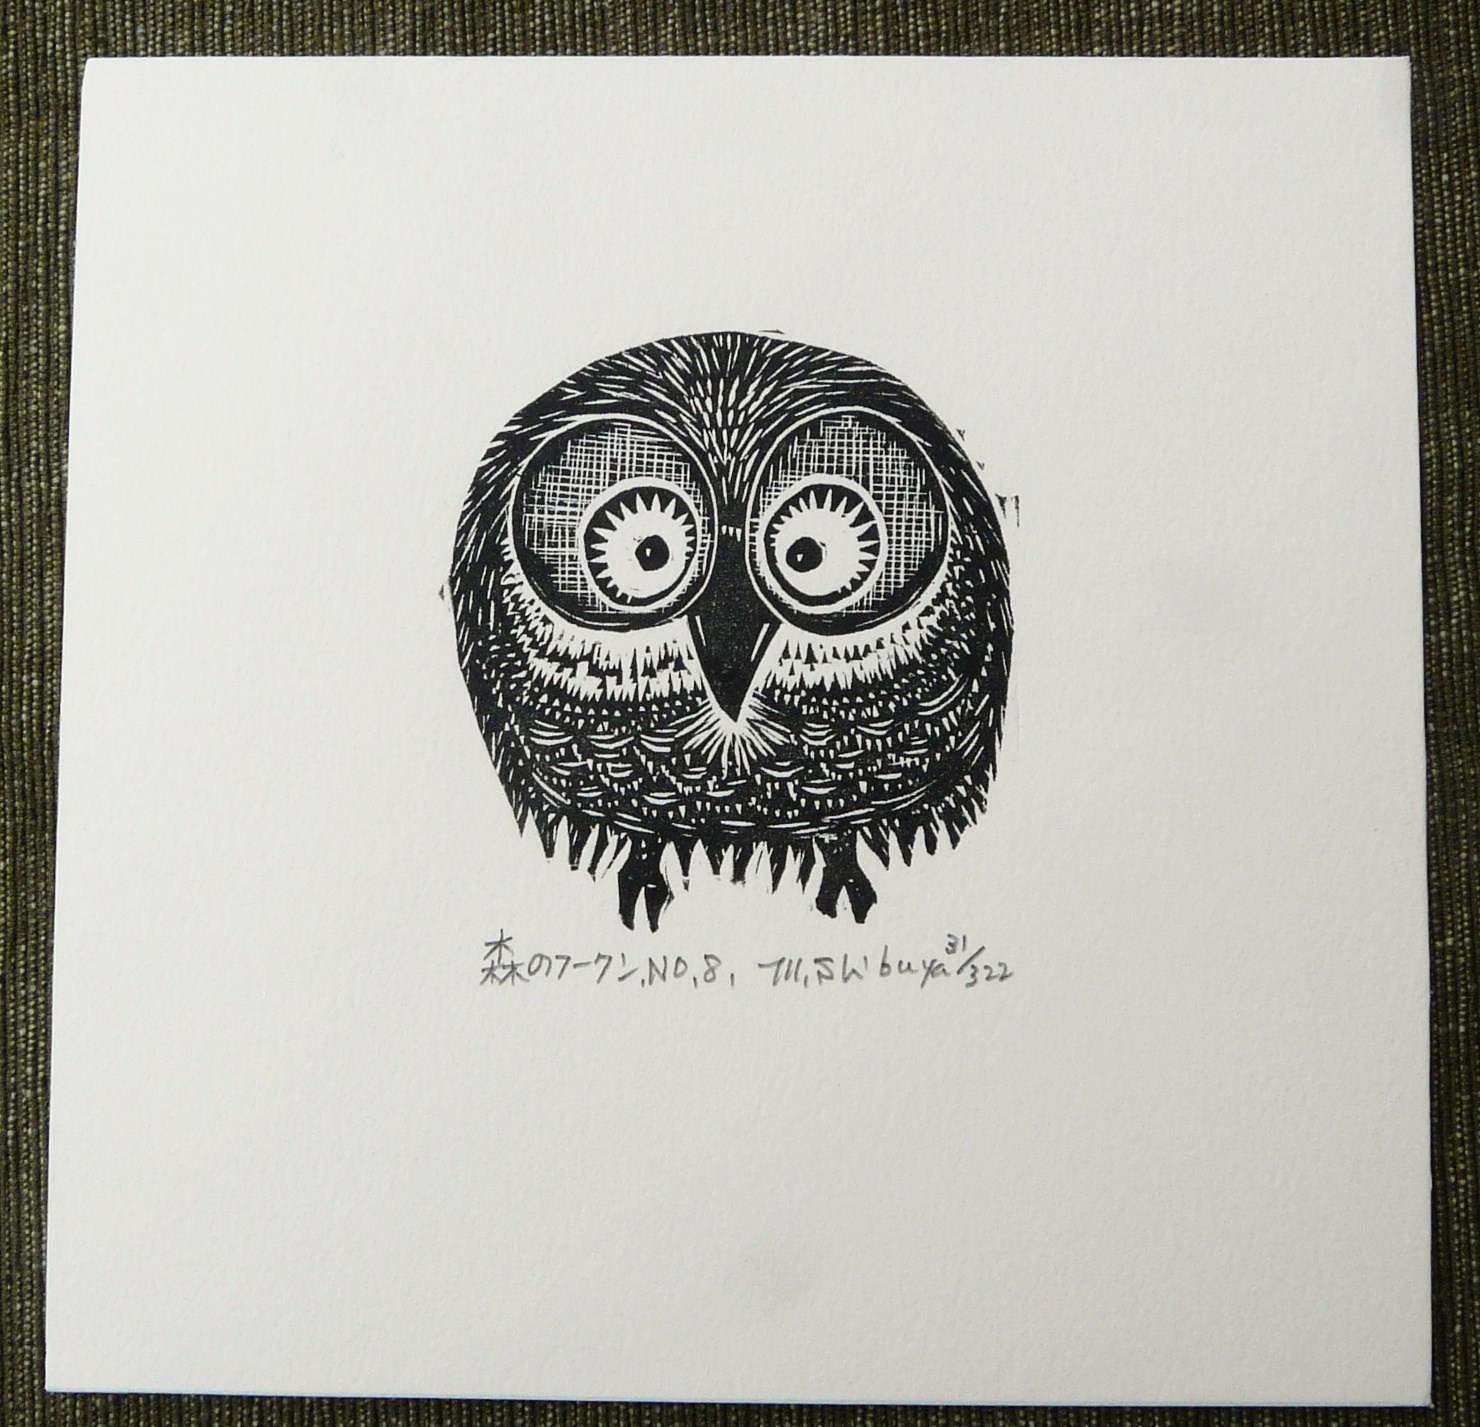 #P4281 FOREST OWL By MASAKI SHIBUYA